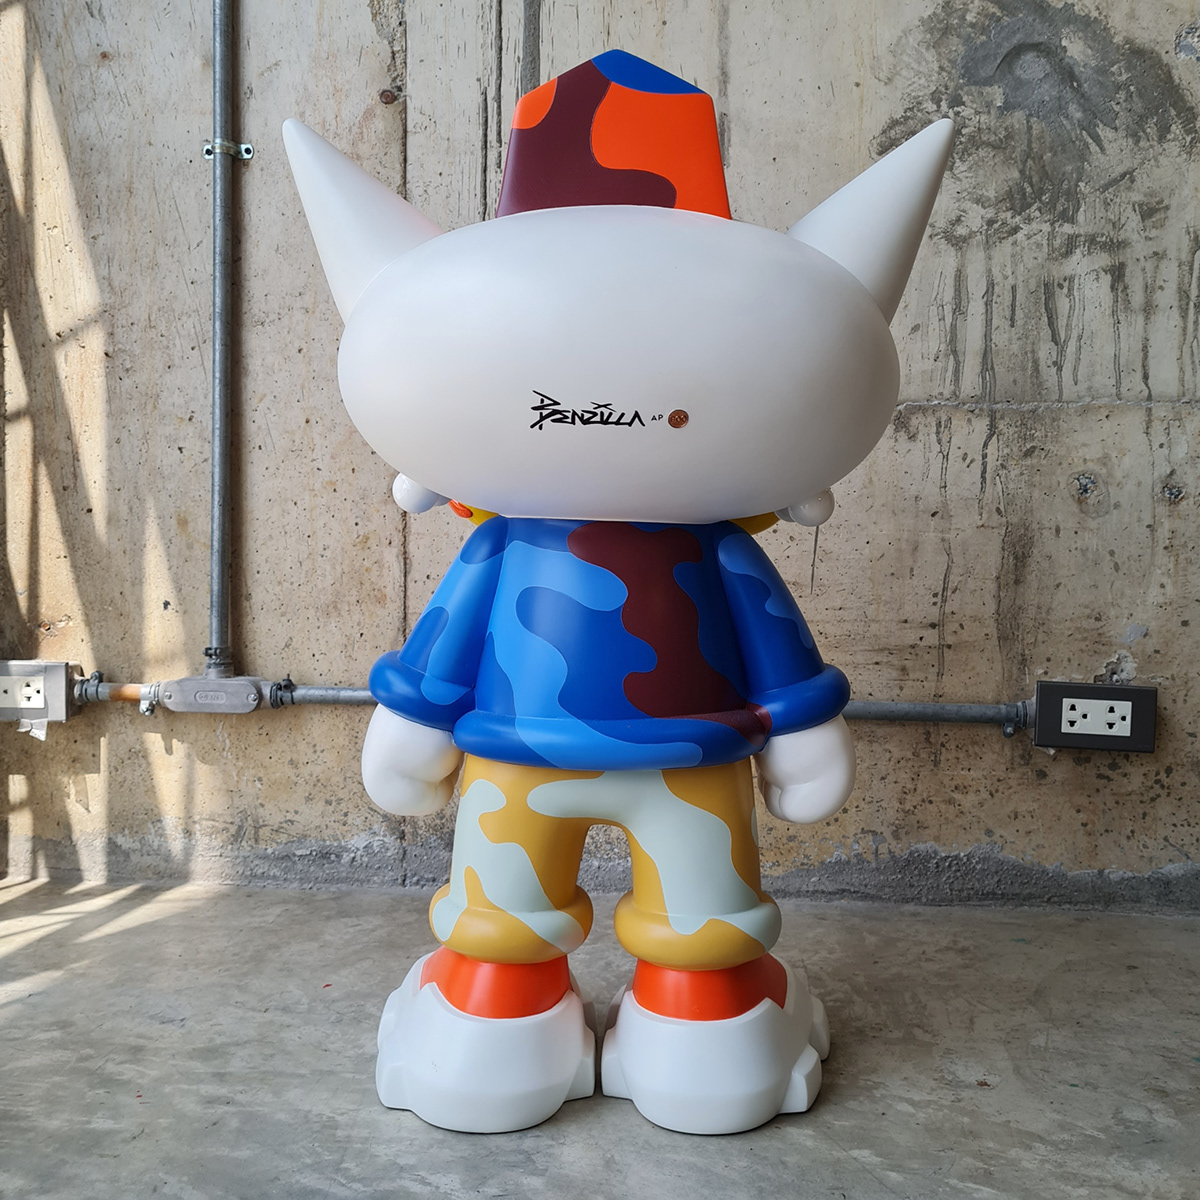 arttoy Character designertoy popart sculpture streetart